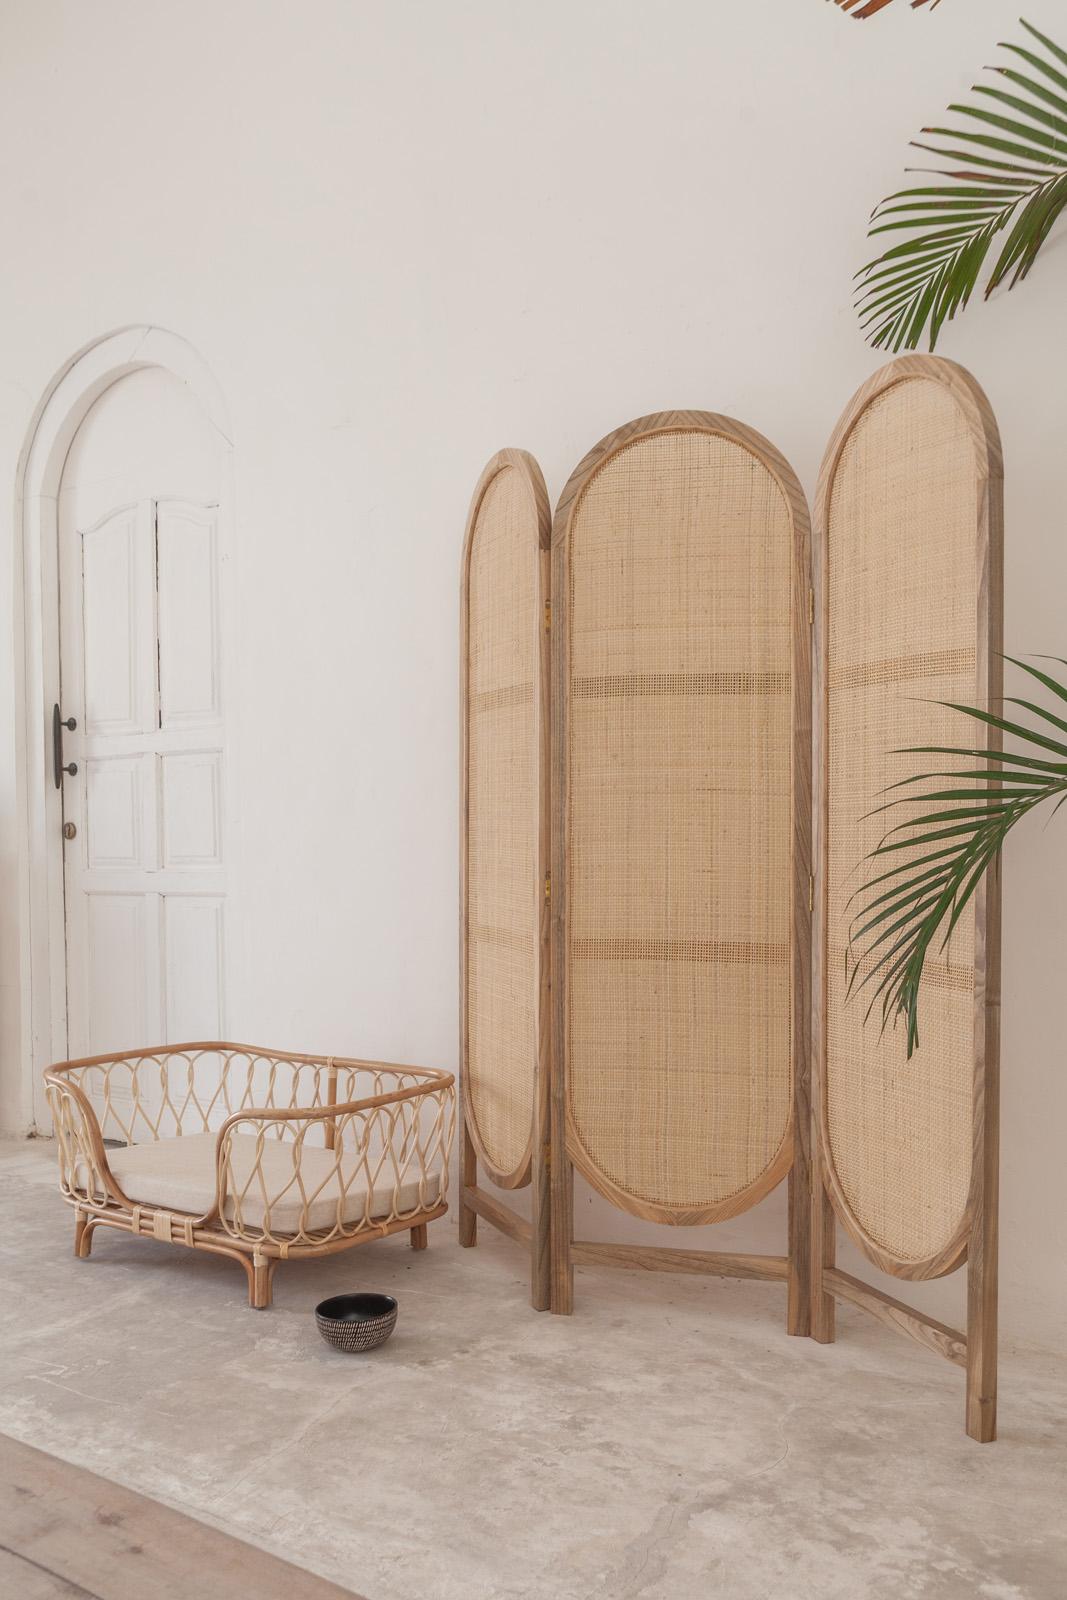 Koko Collective- Bali Interiors- rattan furniture